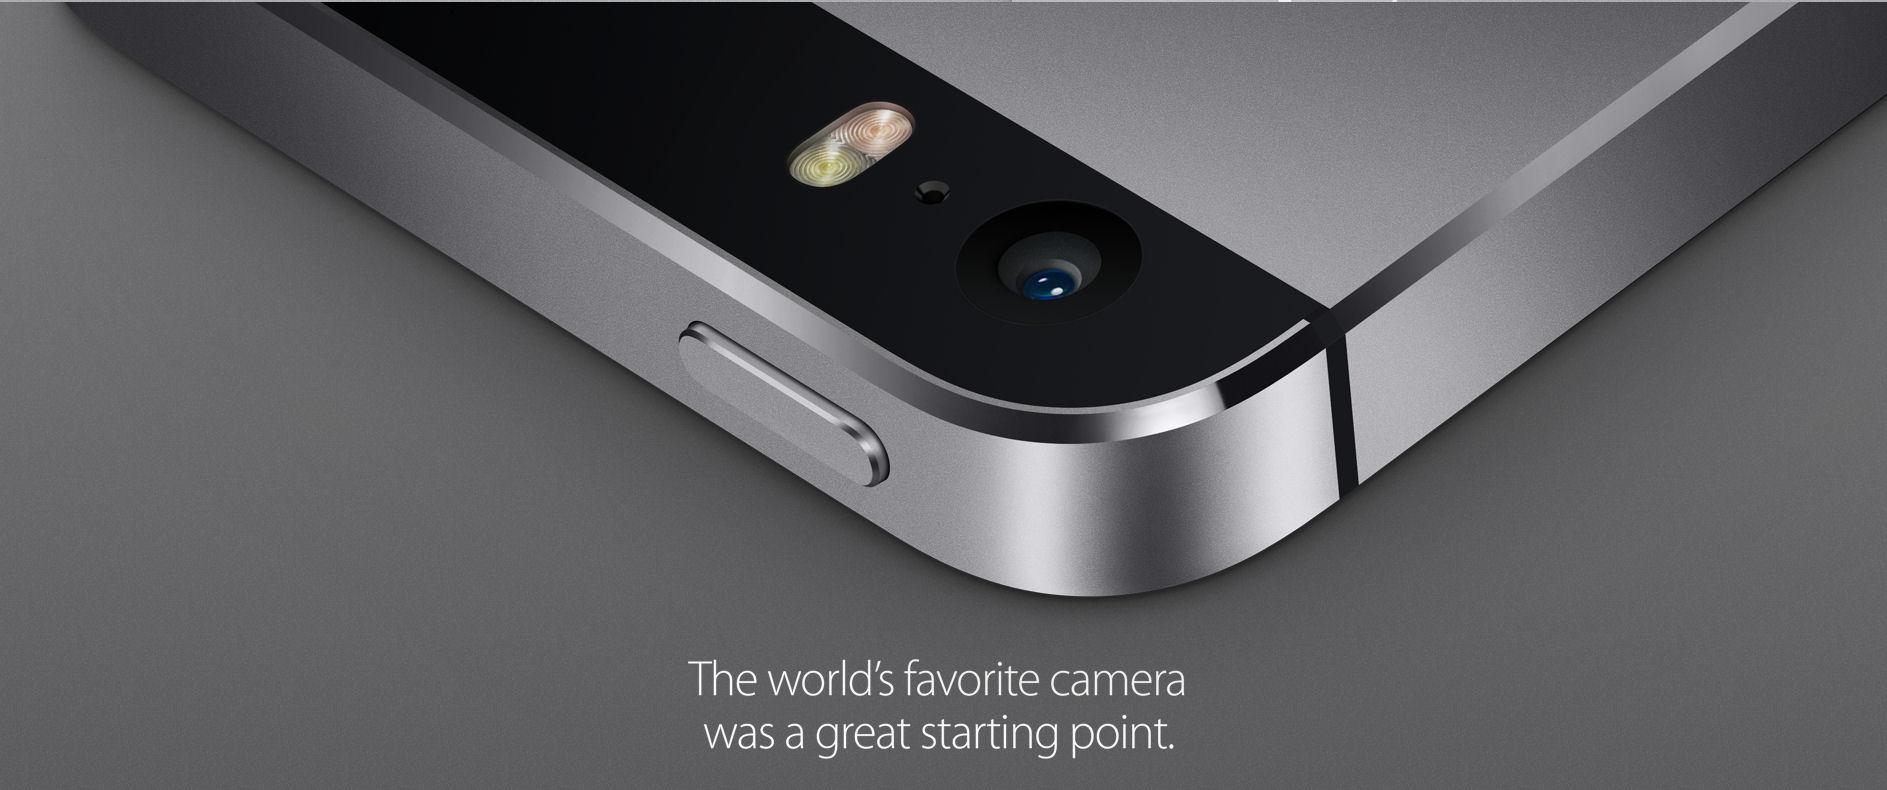 iphone-5s-example